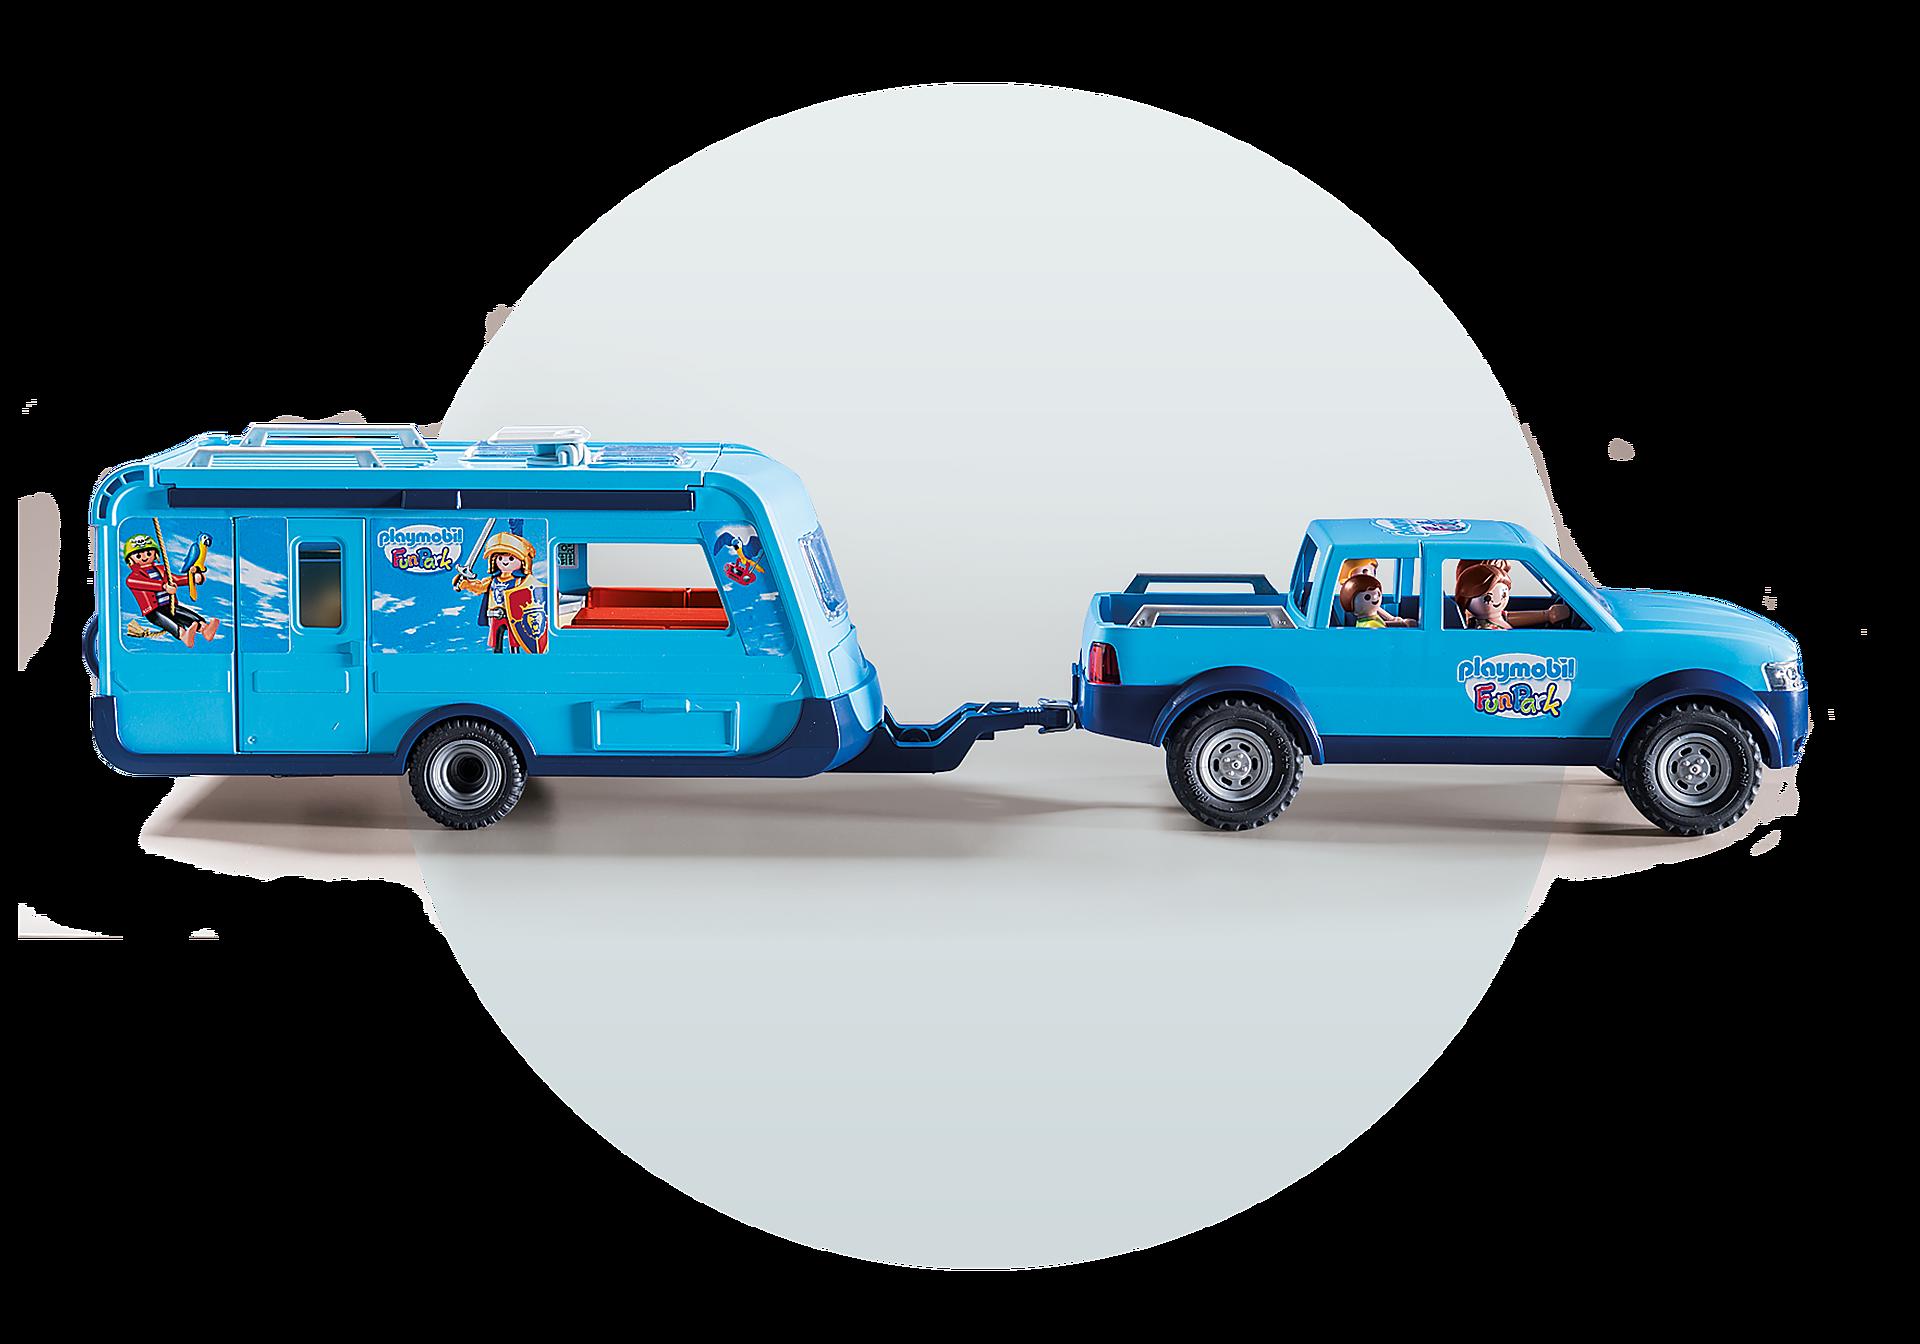 9502 Playmobil-Pick-Up mit Wohnwagen zoom image7